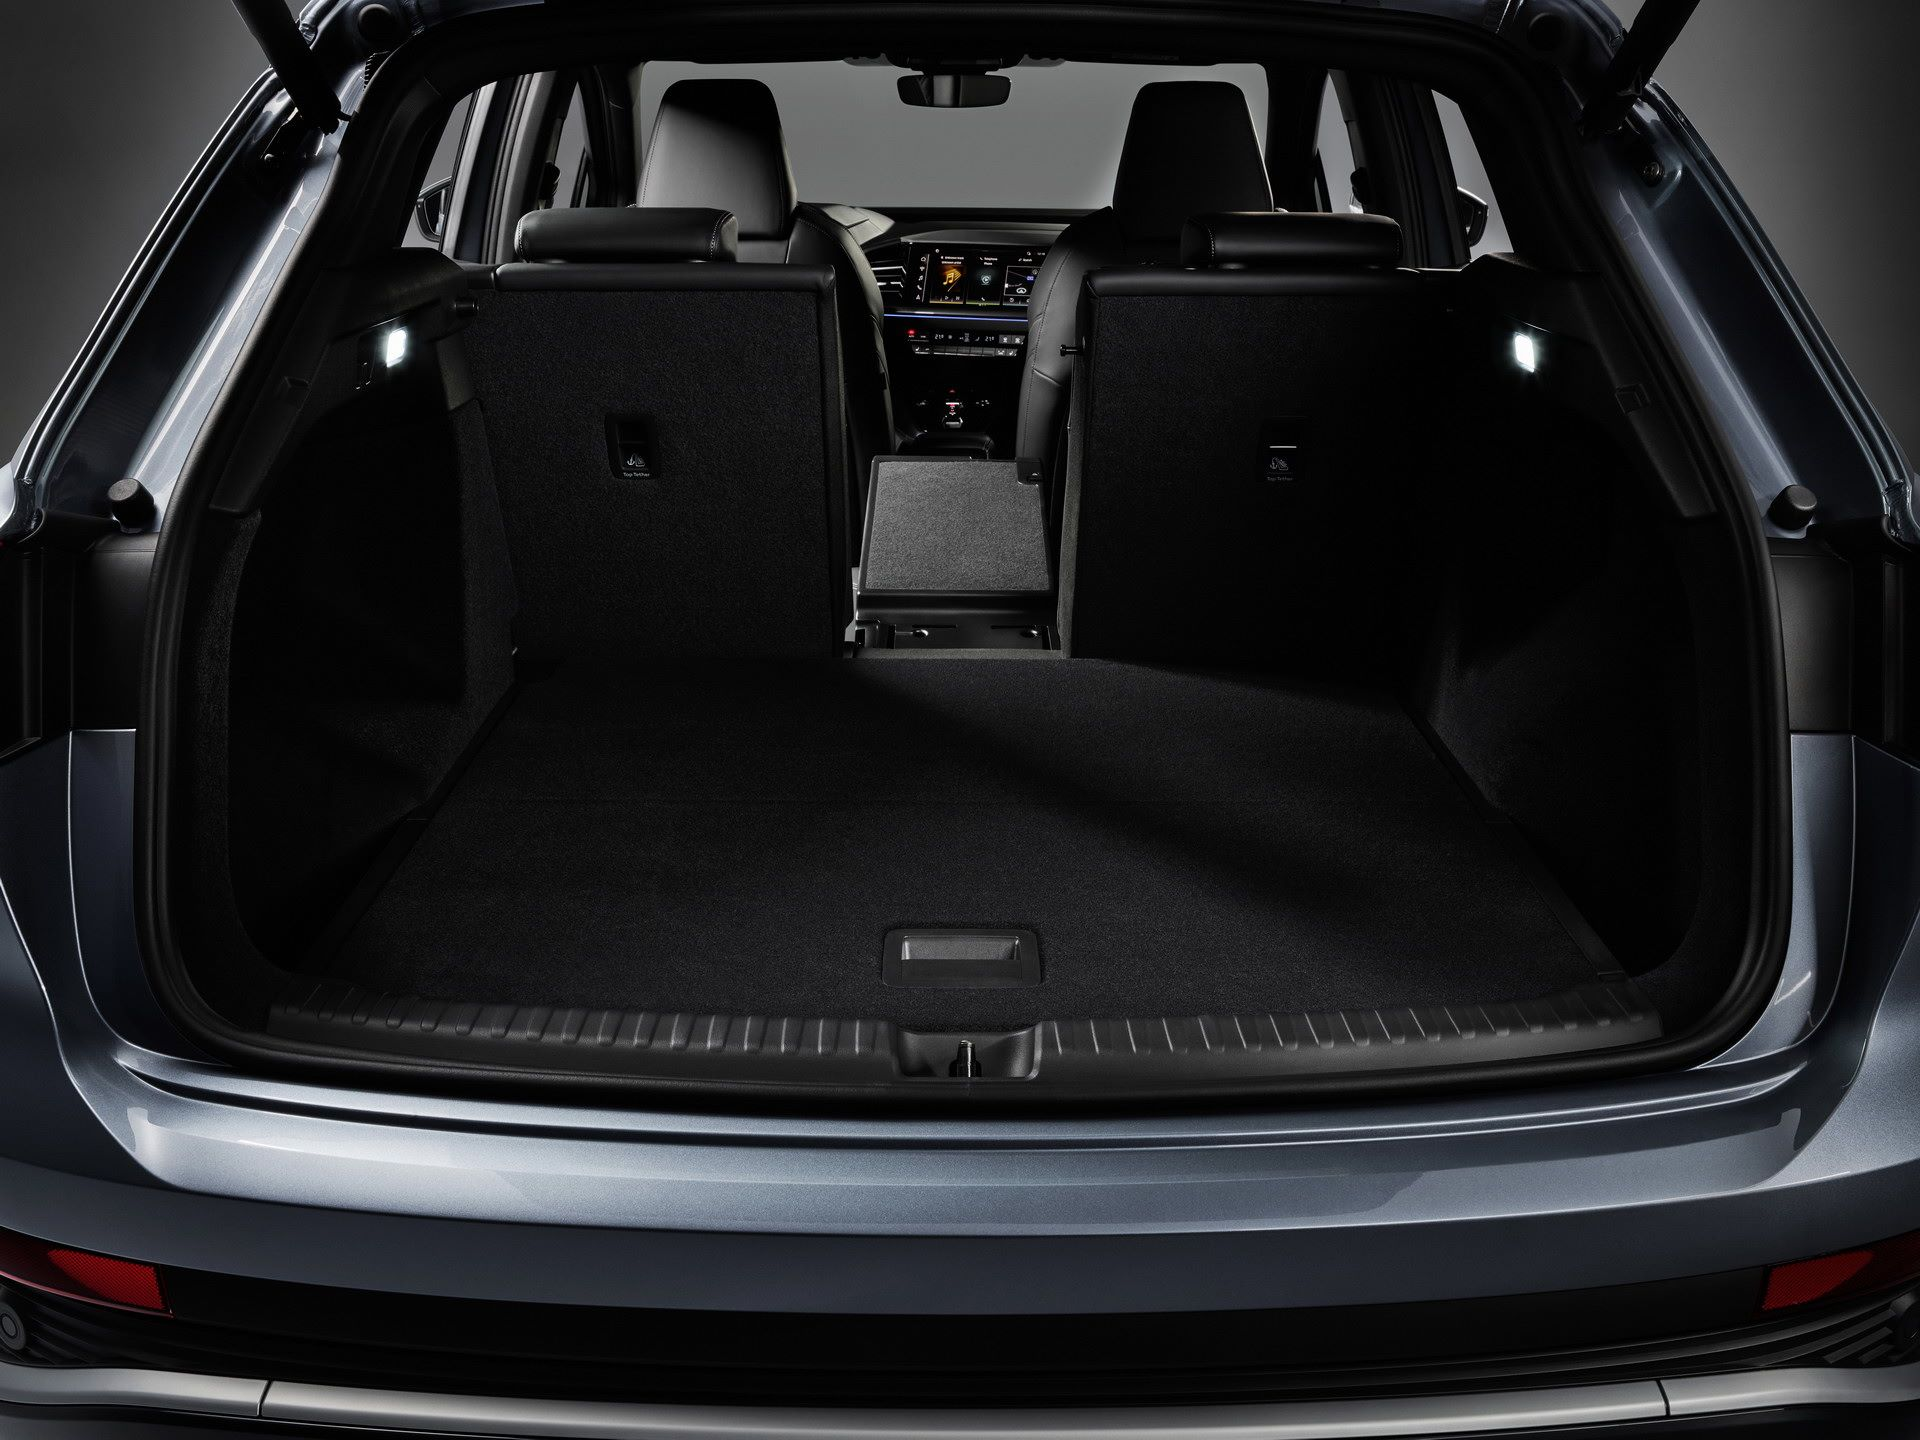 Audi-Q4-e-tron-and-Q4-e-tron-Sportback-72